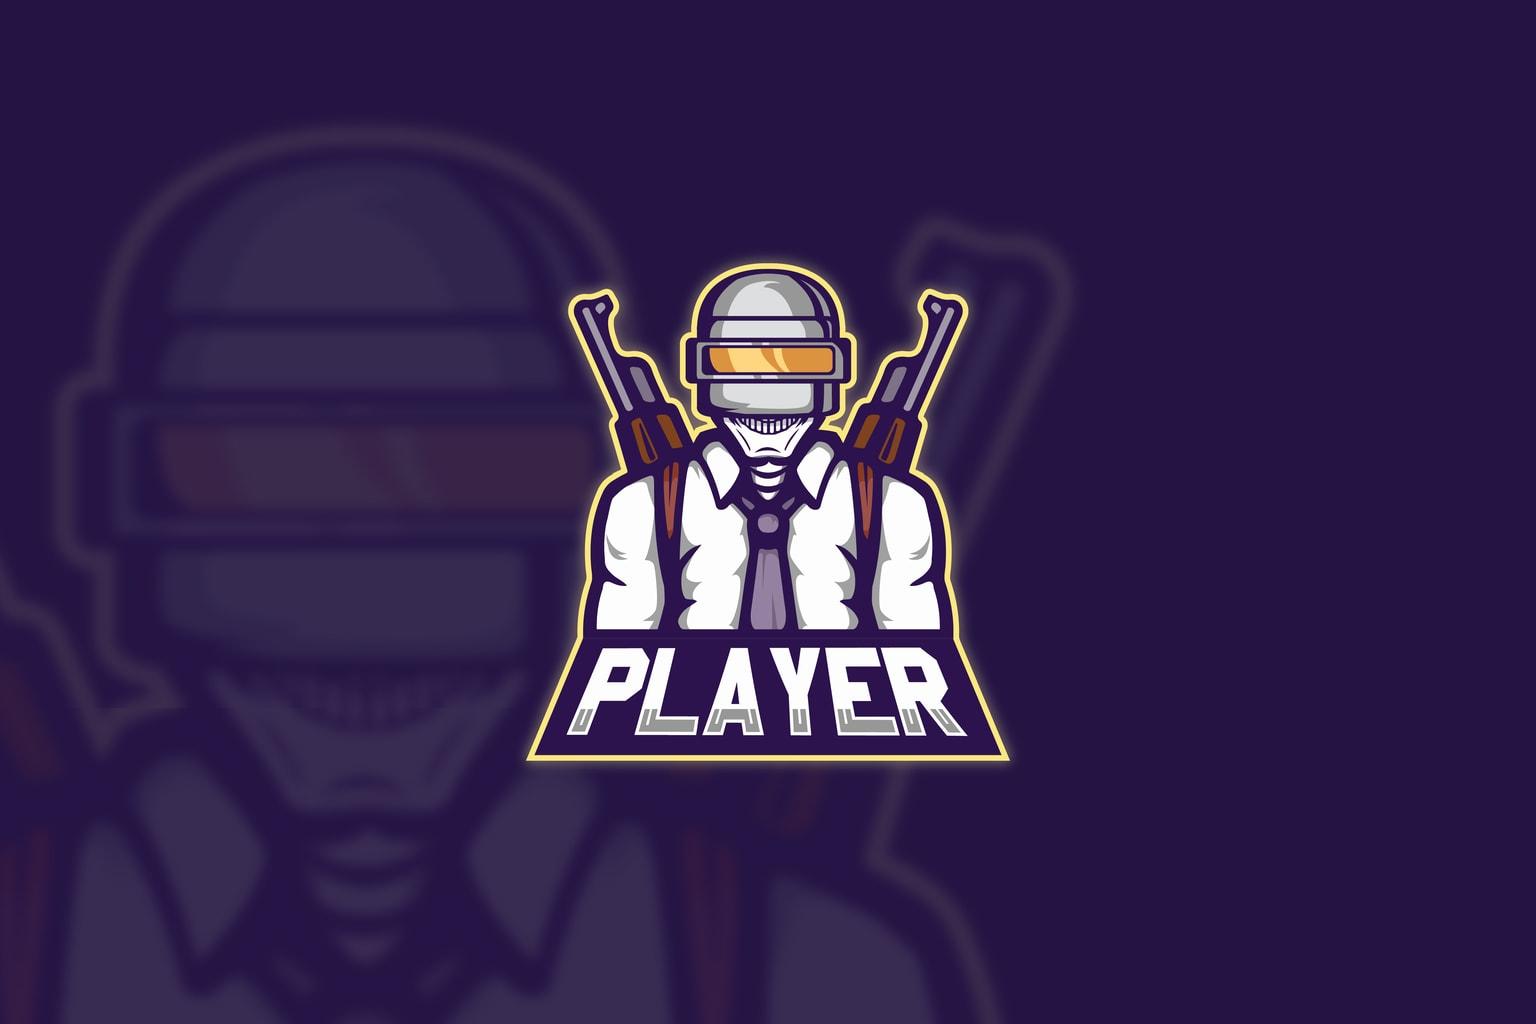 esport logo mobile player